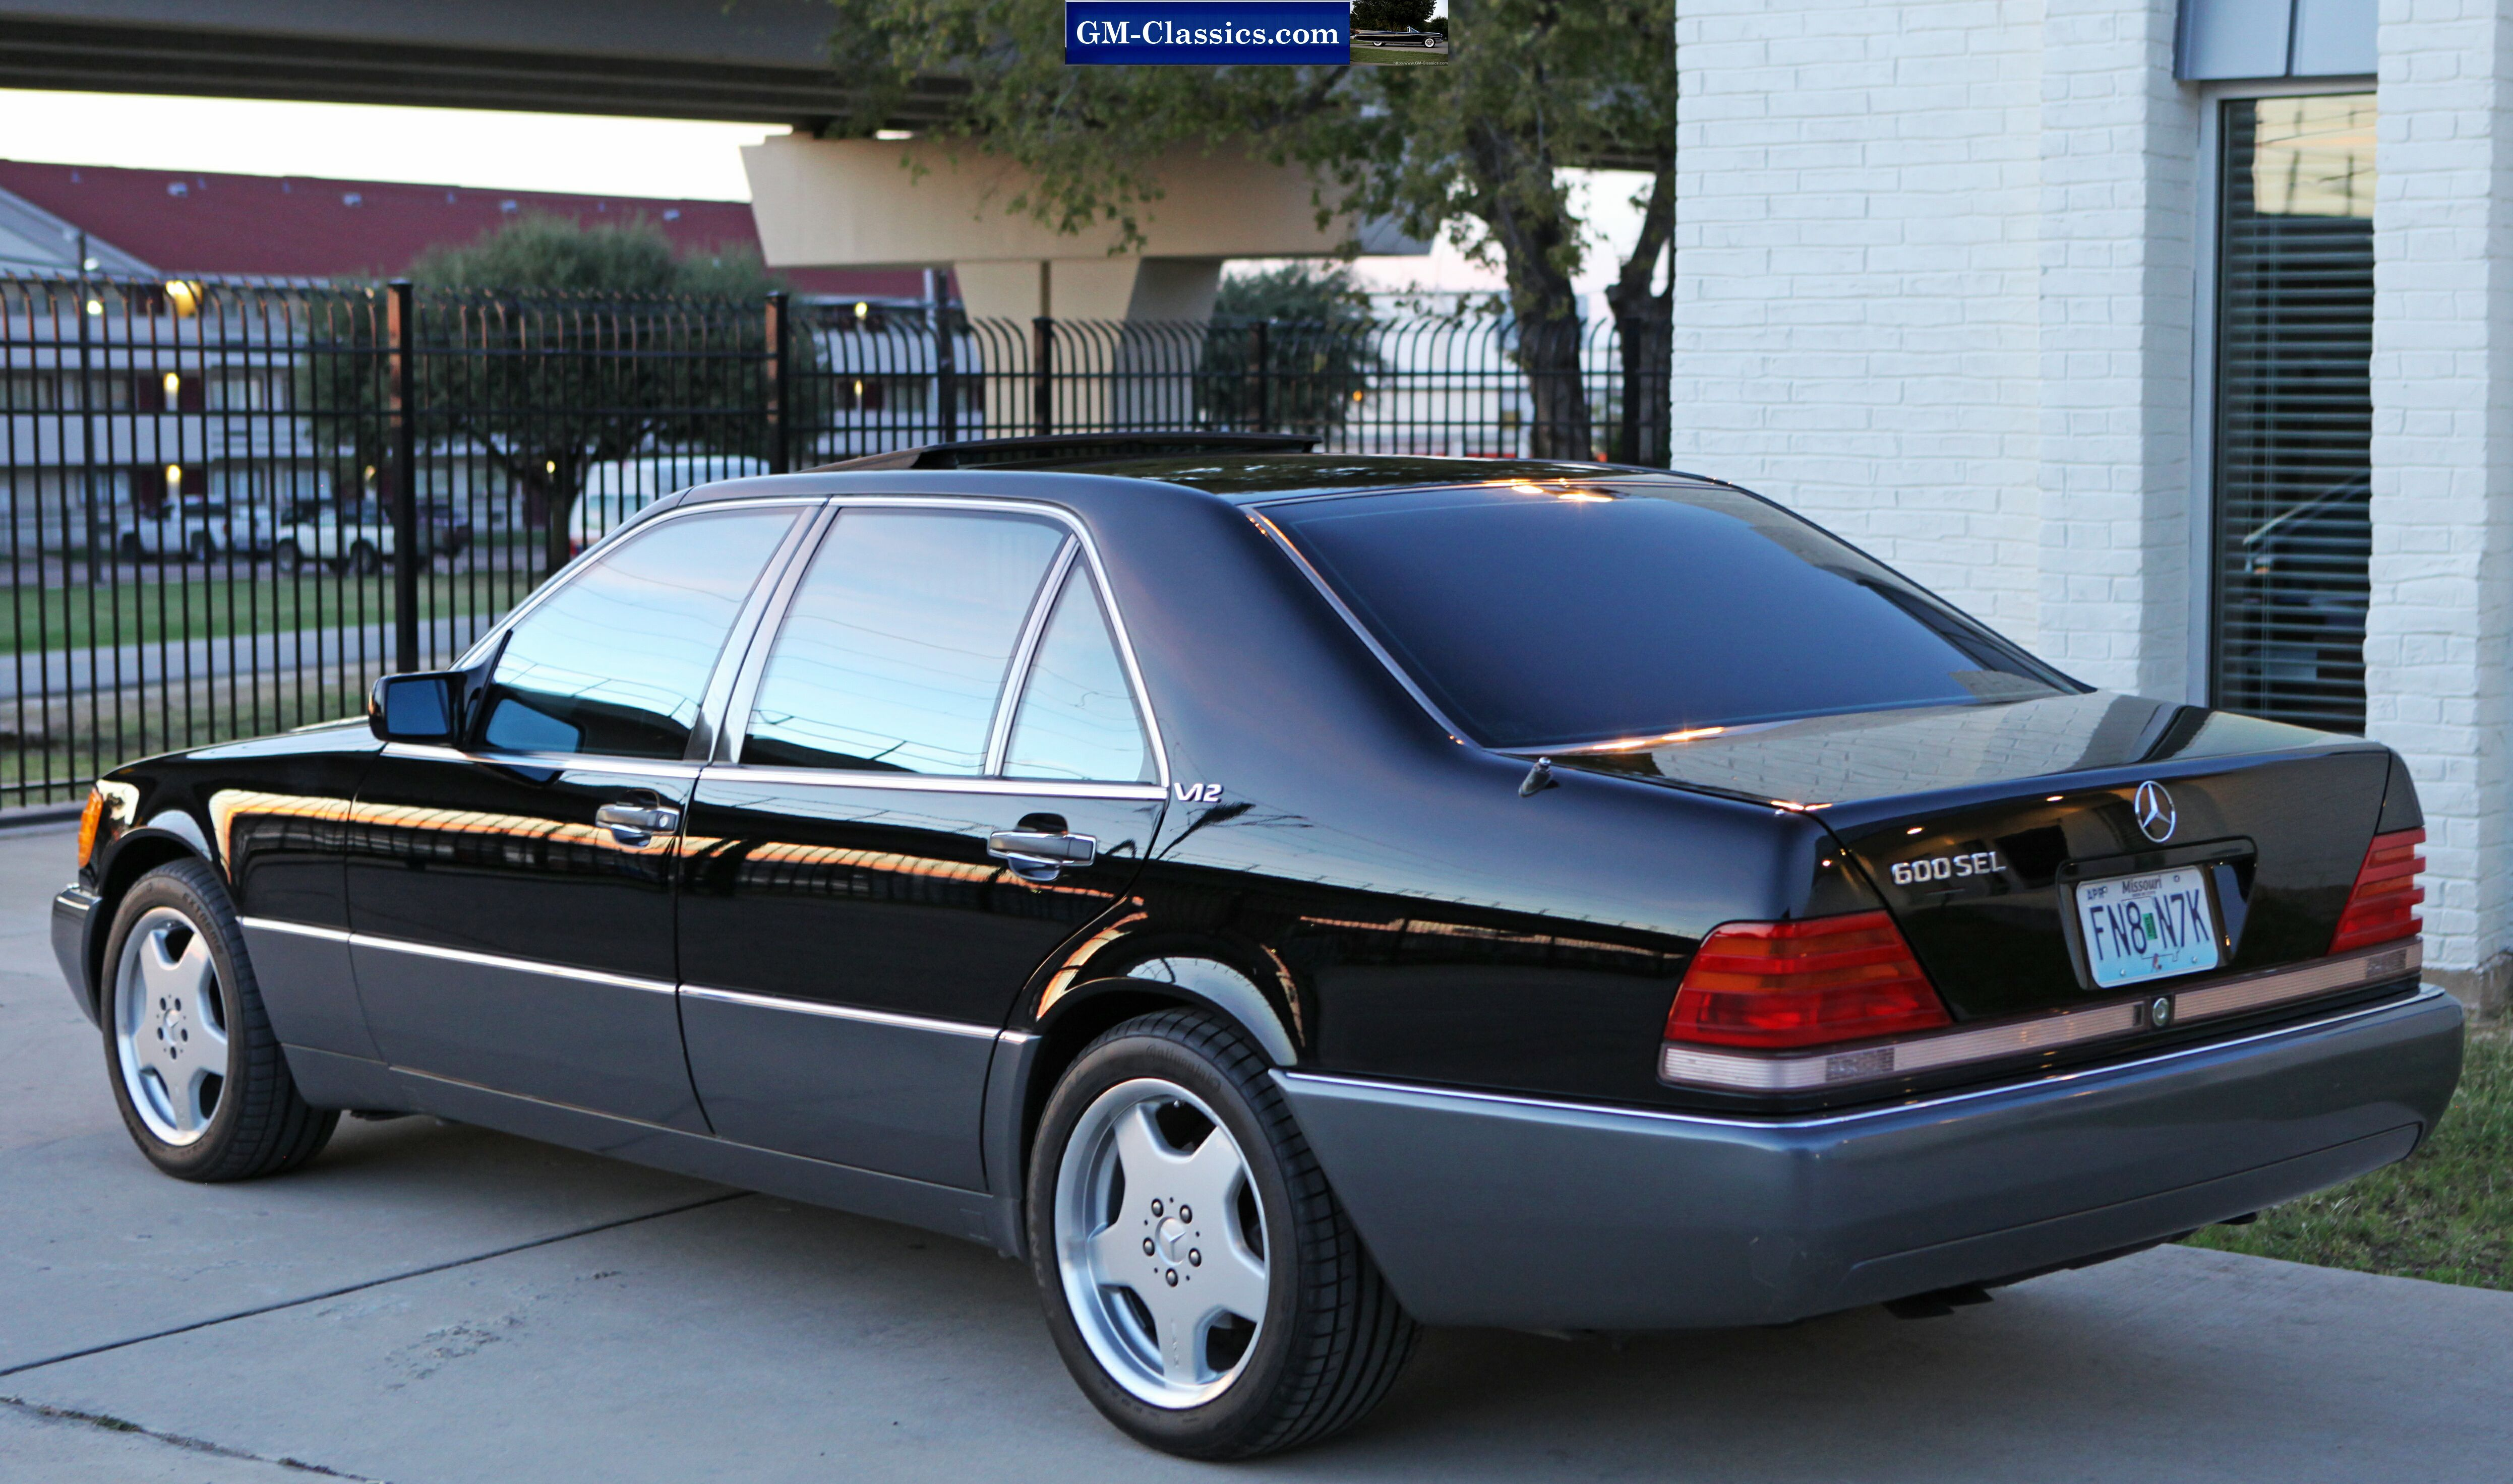 http://www.mcsmk8.com/92-600SEL/HR/CARS-10.JPG